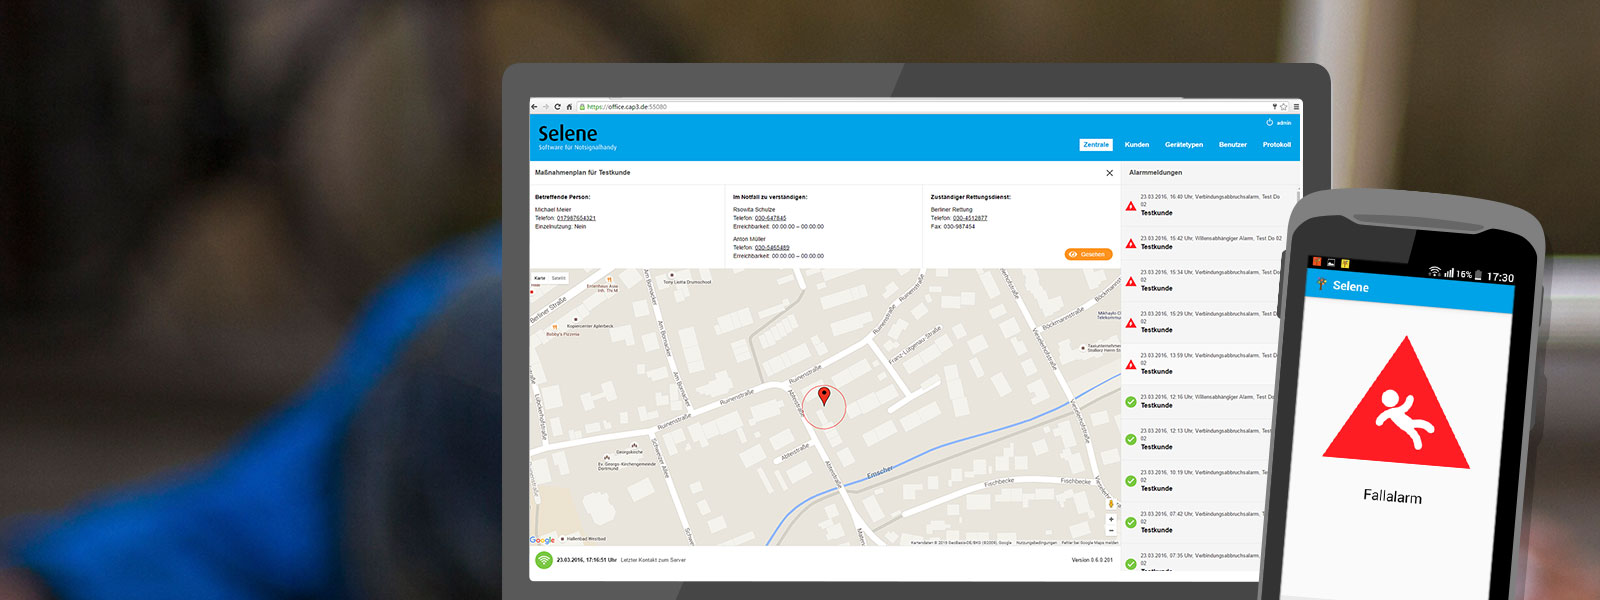 Personen-Notsignal-Anlage: Android-App und Web-App